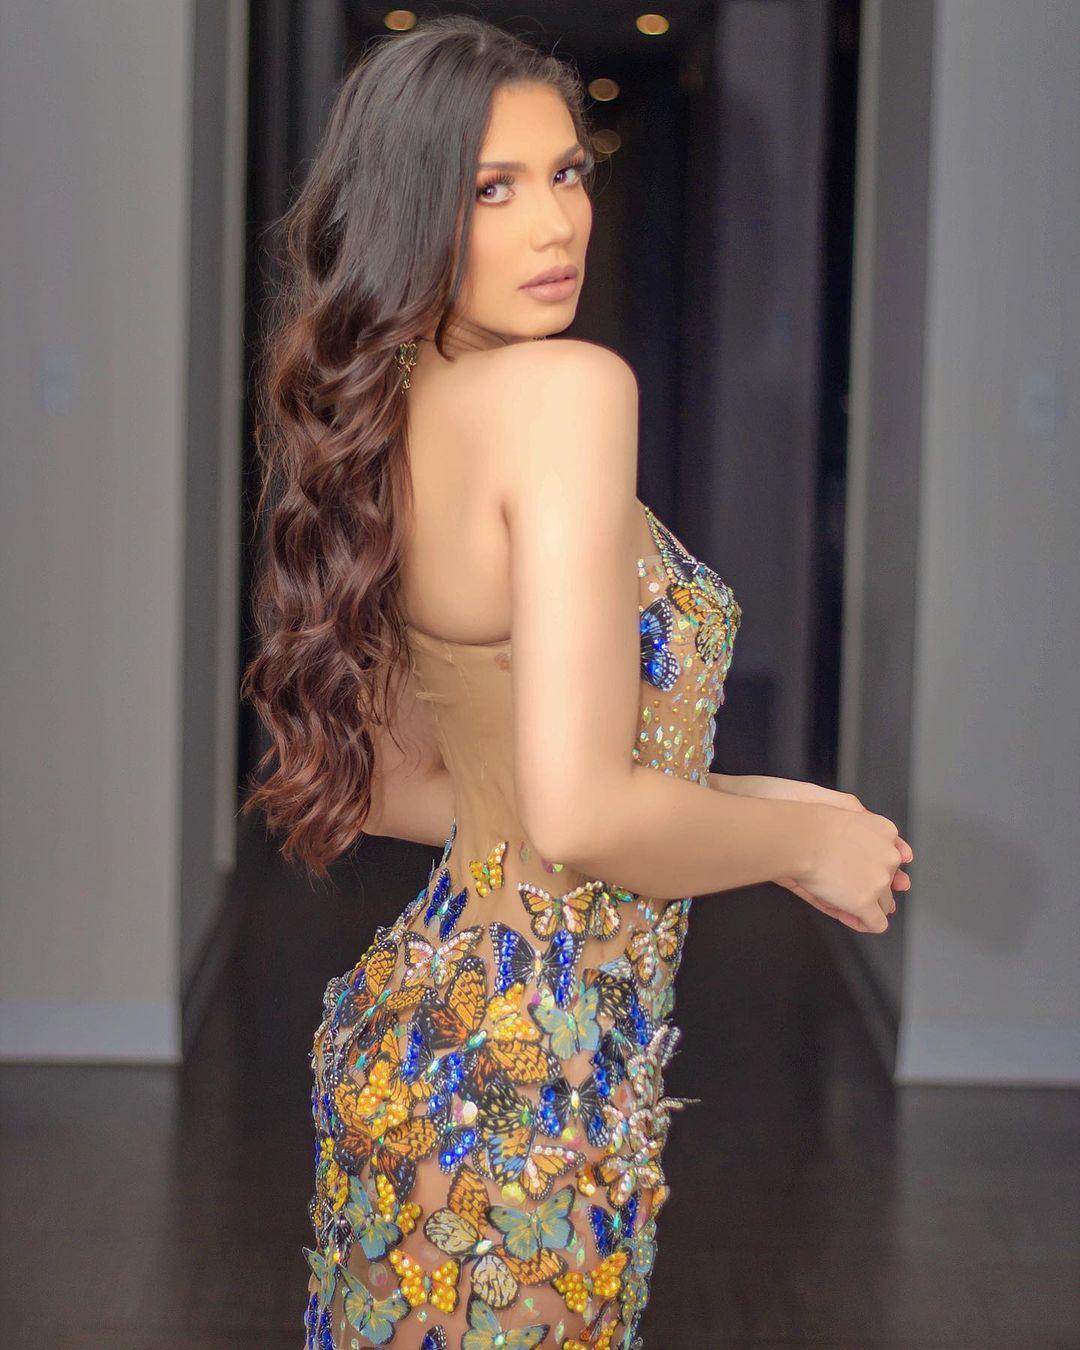 thais bergamini, miss terra brasil 2020. Thaisb13